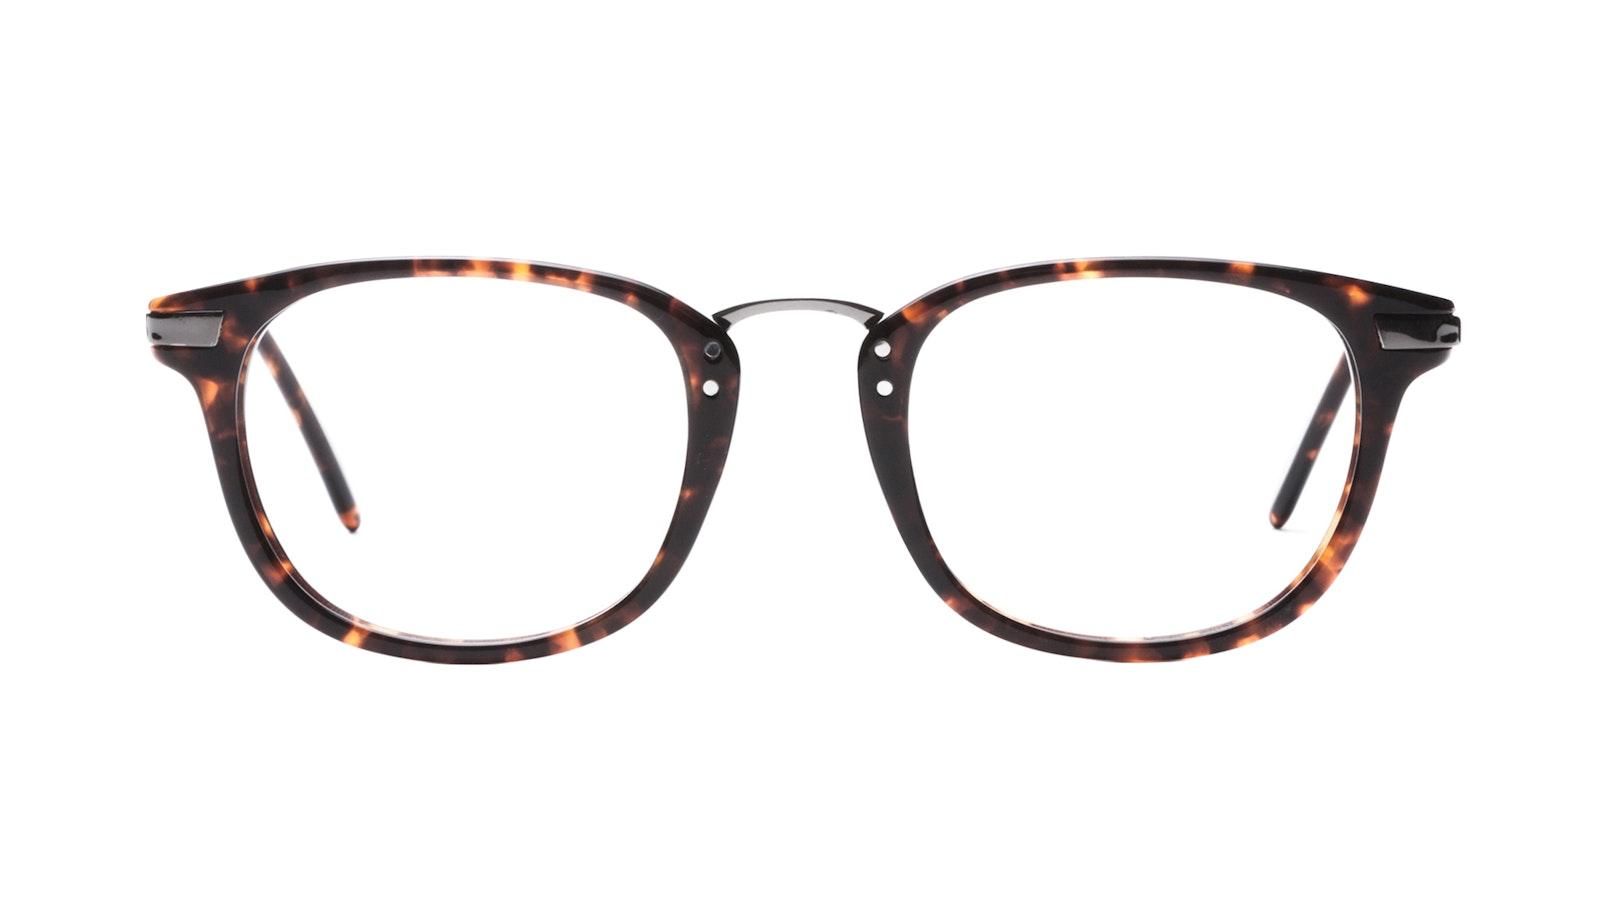 Affordable Fashion Glasses Rectangle Square Eyeglasses Men Daze Sepia